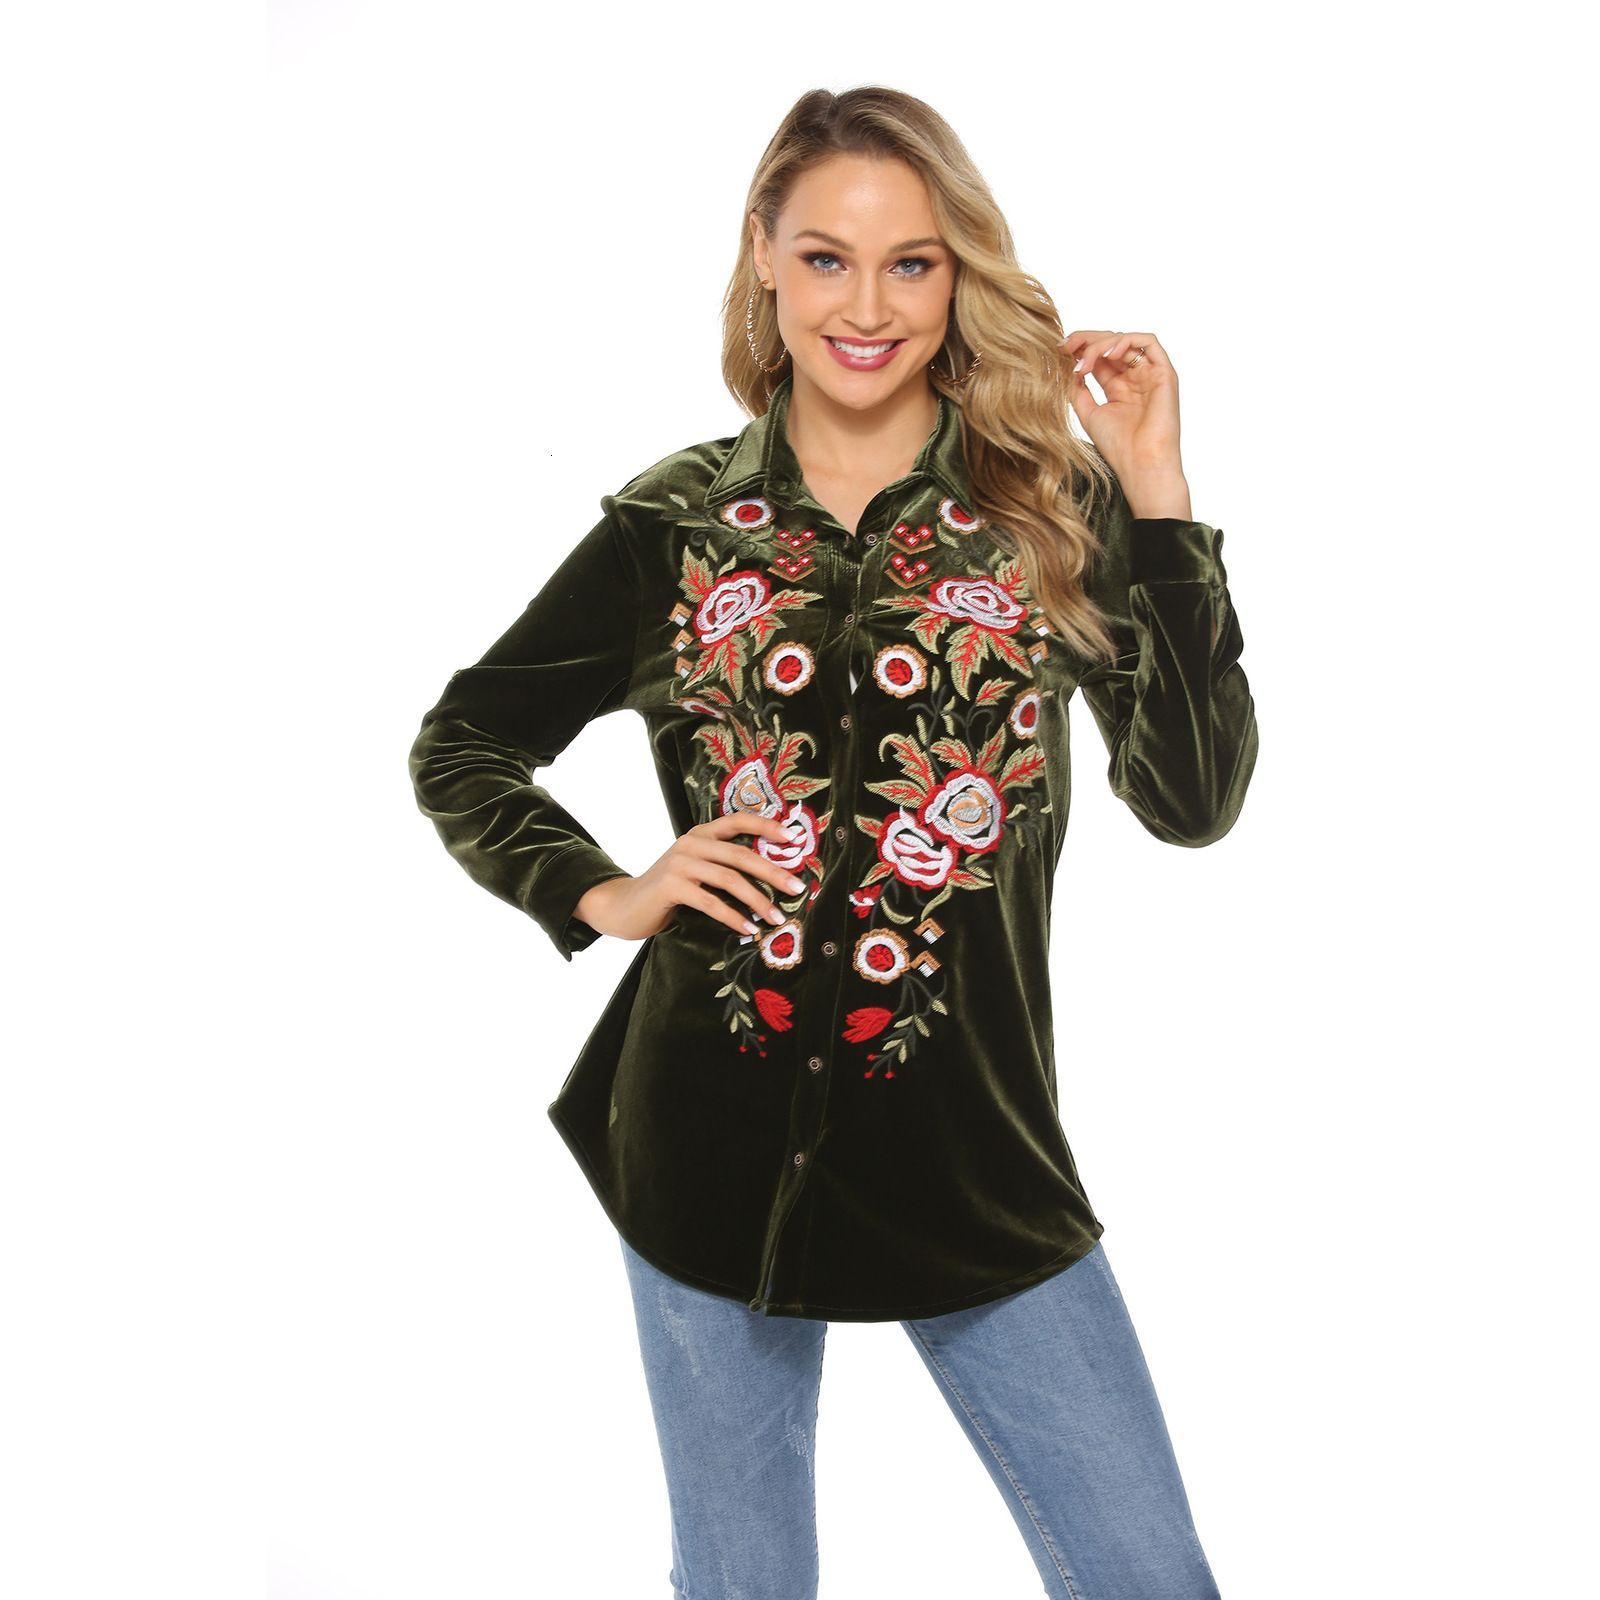 Mode Frauen Pullover Marke Herbst Winter Hemd Mantel Langarm Übersee